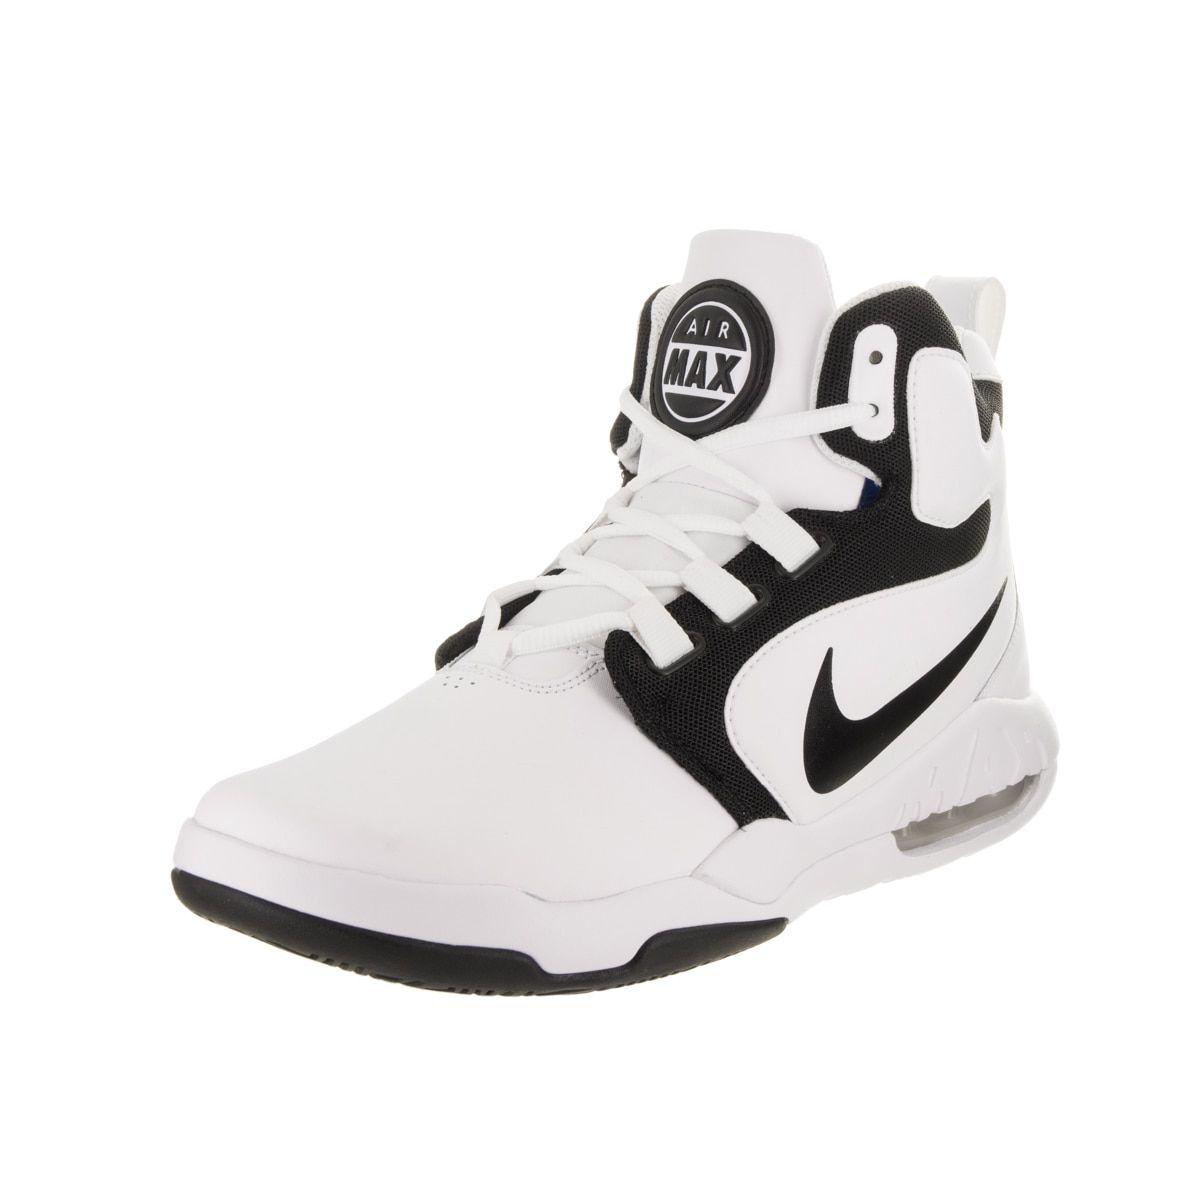 size 40 c8a08 a83d6 Nike Men s Air Conversion Basketball Shoe